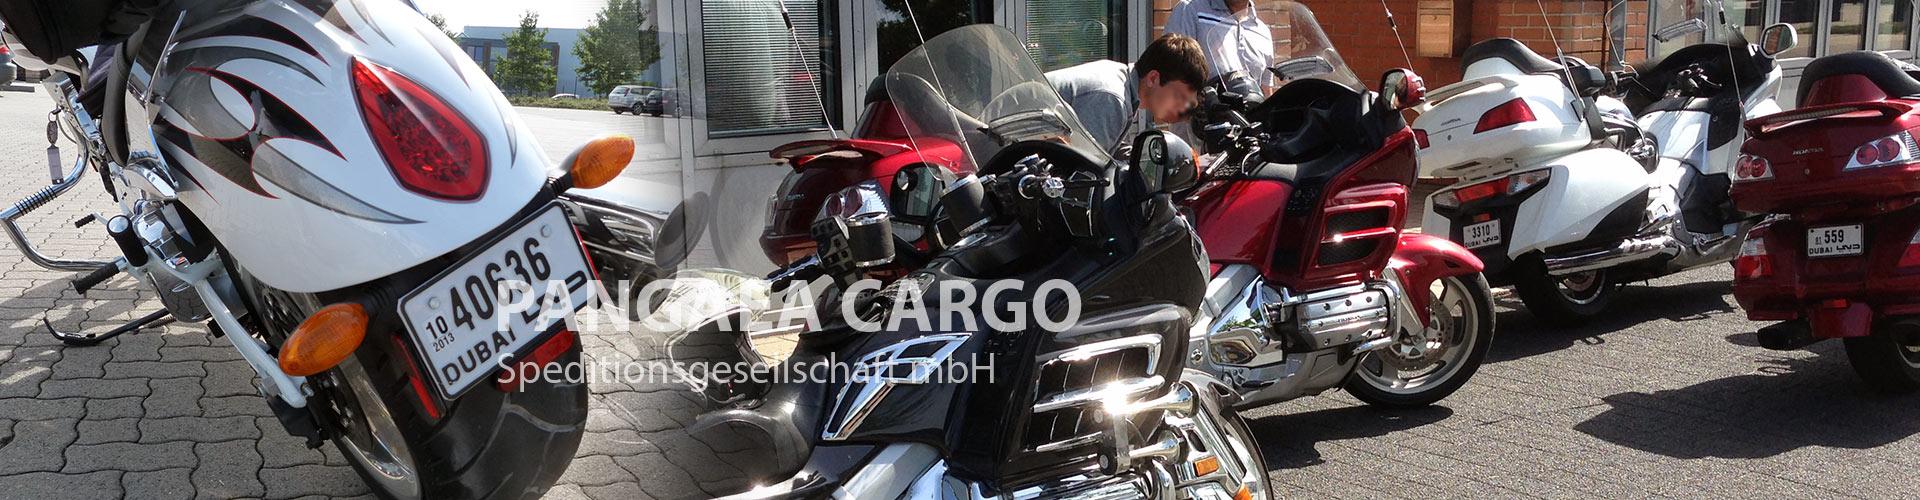 Dubai-Motorcycle-Transport